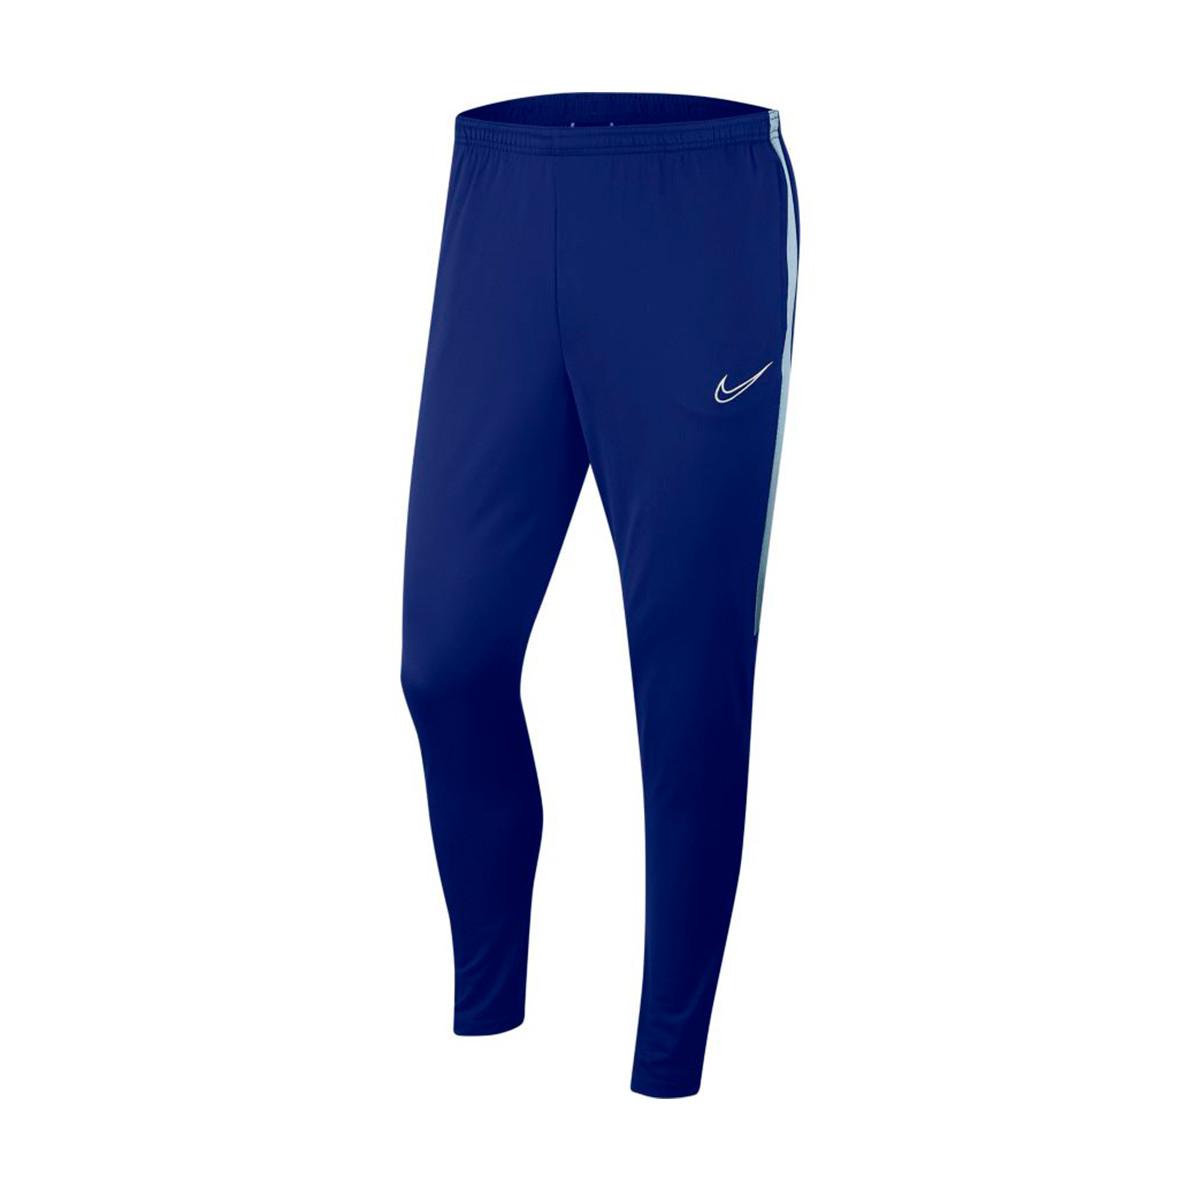 Asistencia Despedida Samuel  Long pants Nike Dri-Fit Academy KPZ Deep royal blue-Lite armory blue-White  - Football store Fútbol Emotion